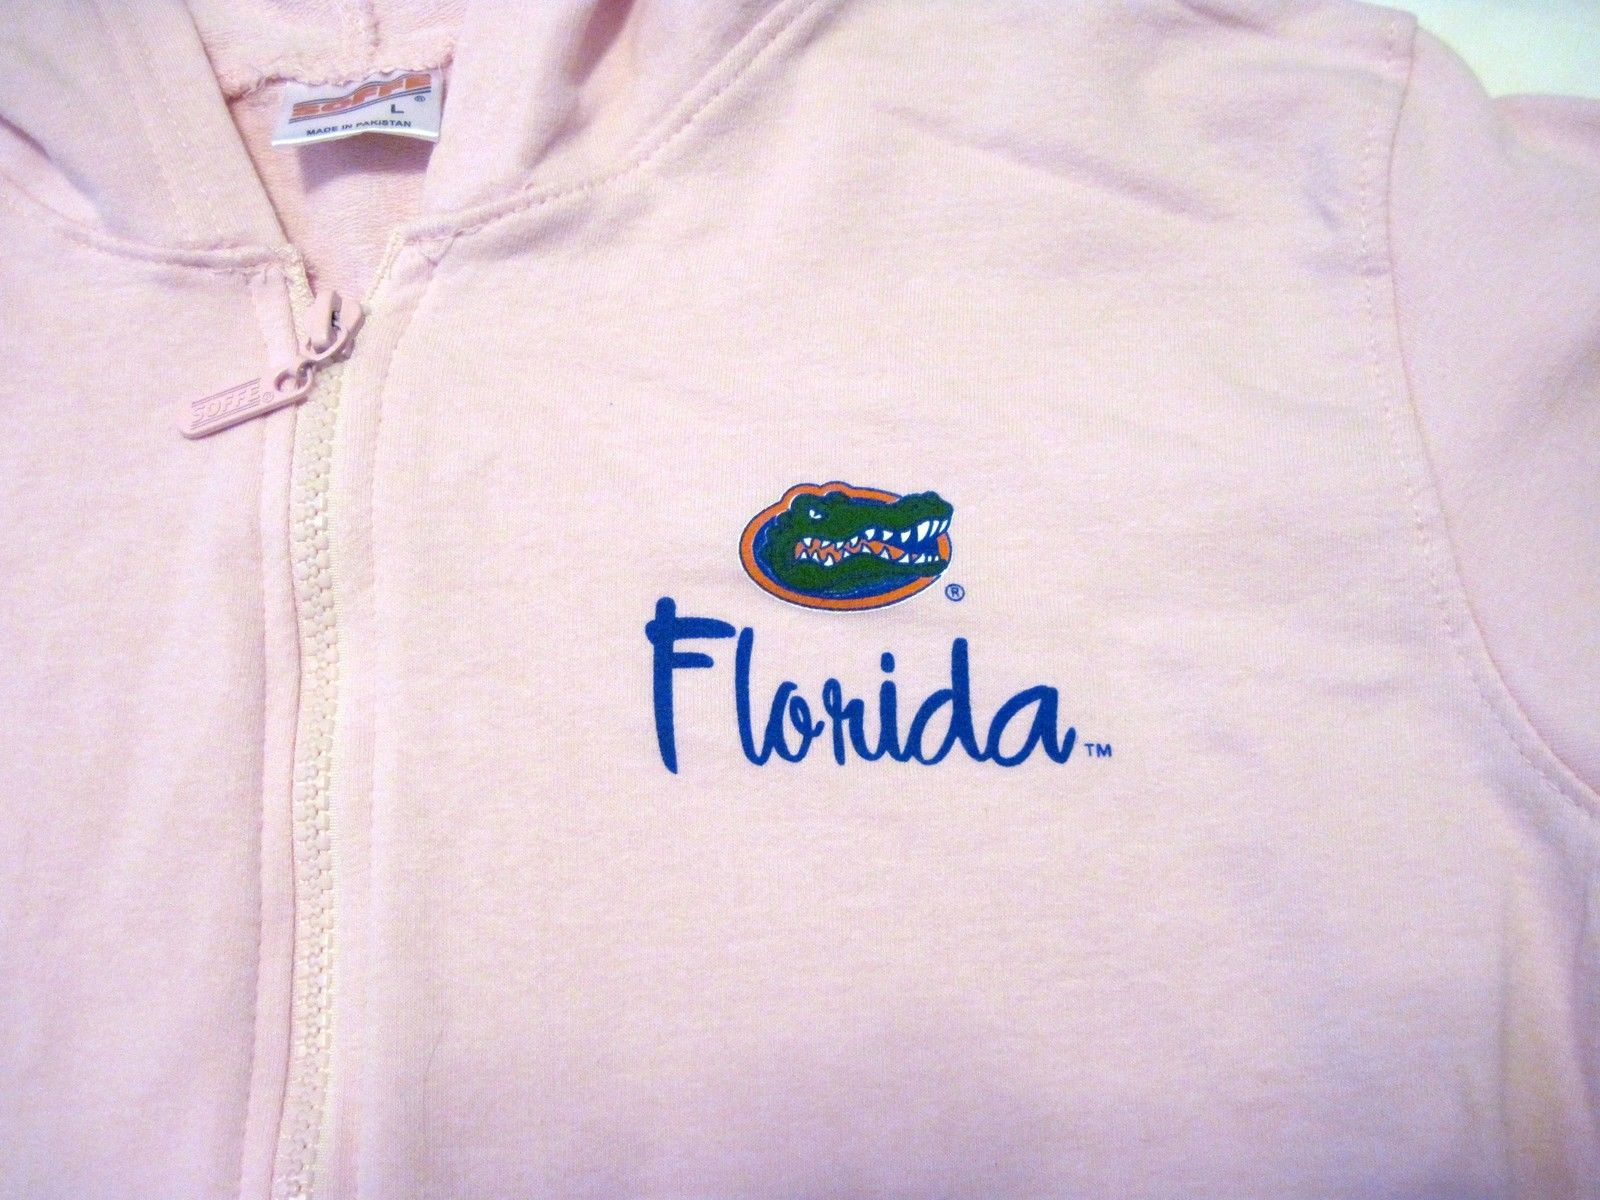 NWT University of Florida UF Gators Hoodie Zipper Jacket Pink Lt Gray by Soffe image 6